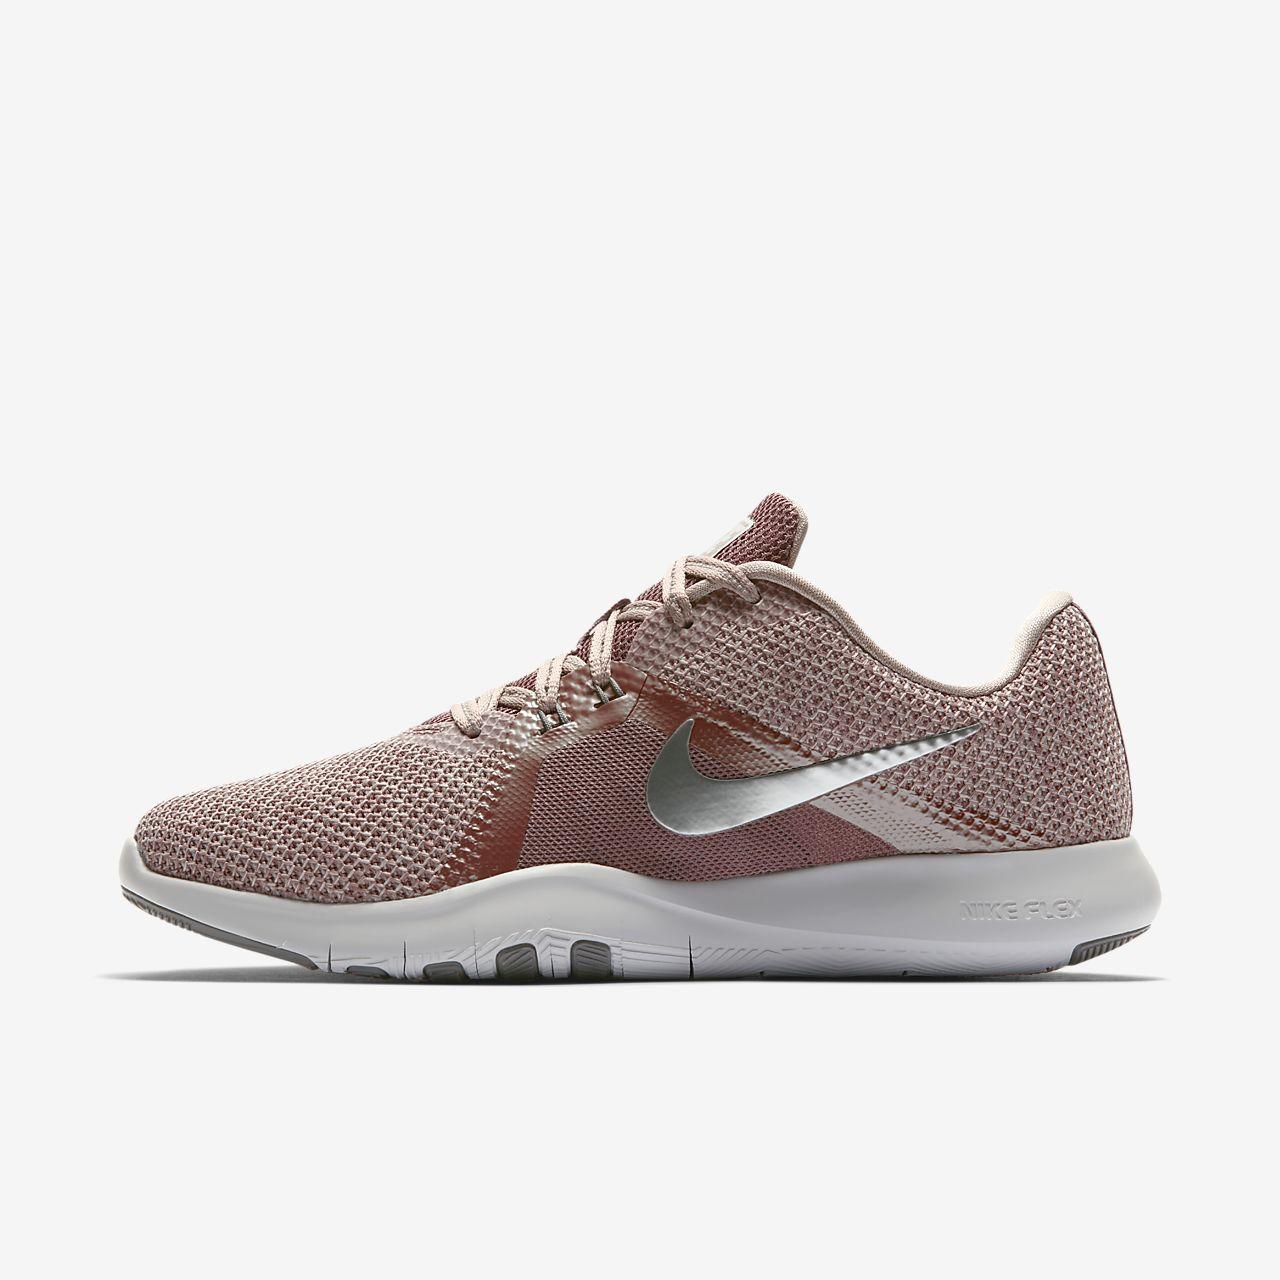 Dámská bota Nike Flex Trainer 8 Premium – fitko/trénink/cvičení